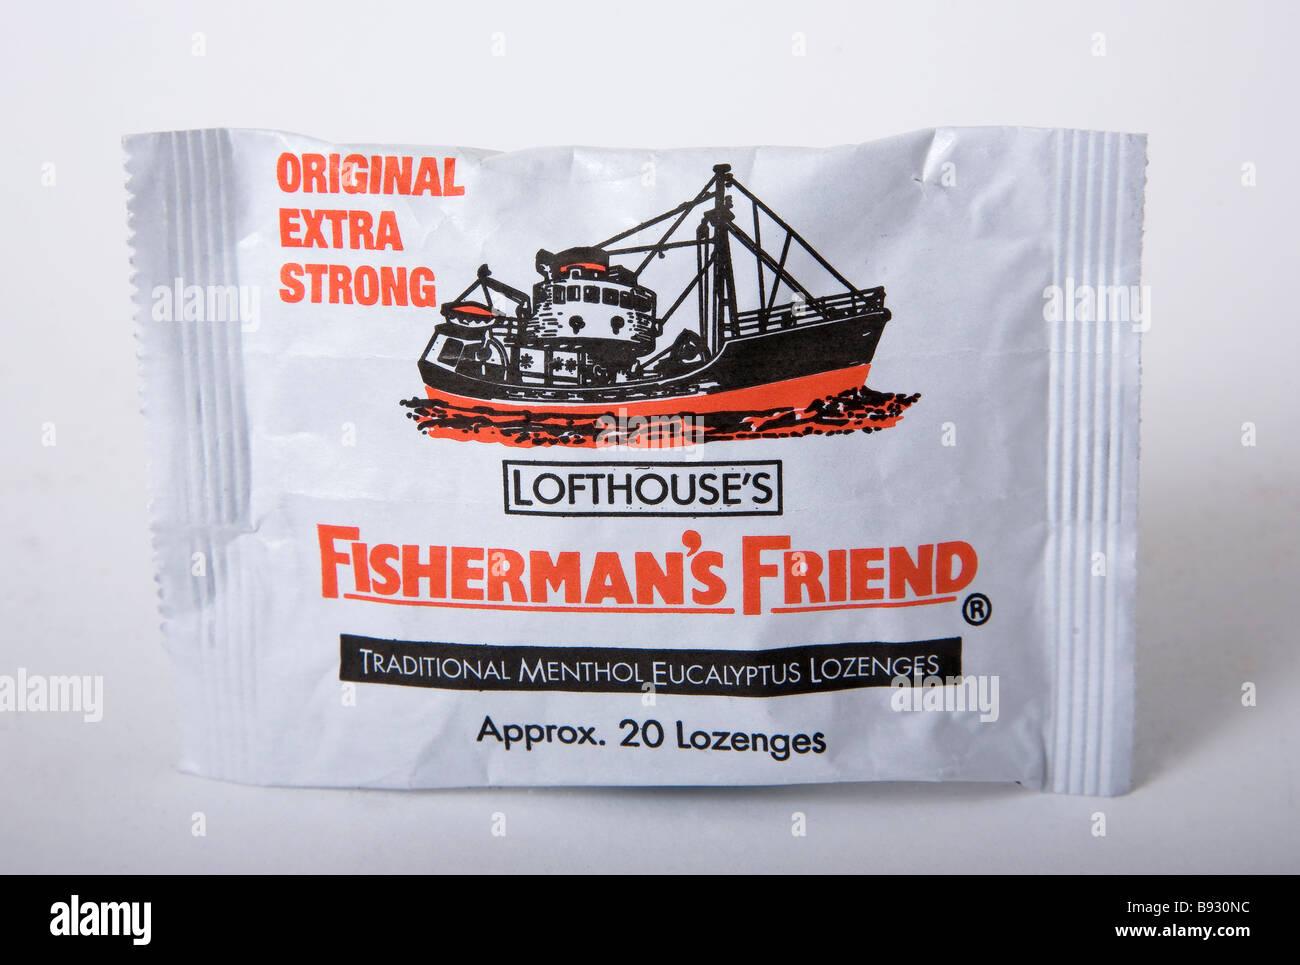 Fisherman Fisherman's Friend originale Immagini Stock